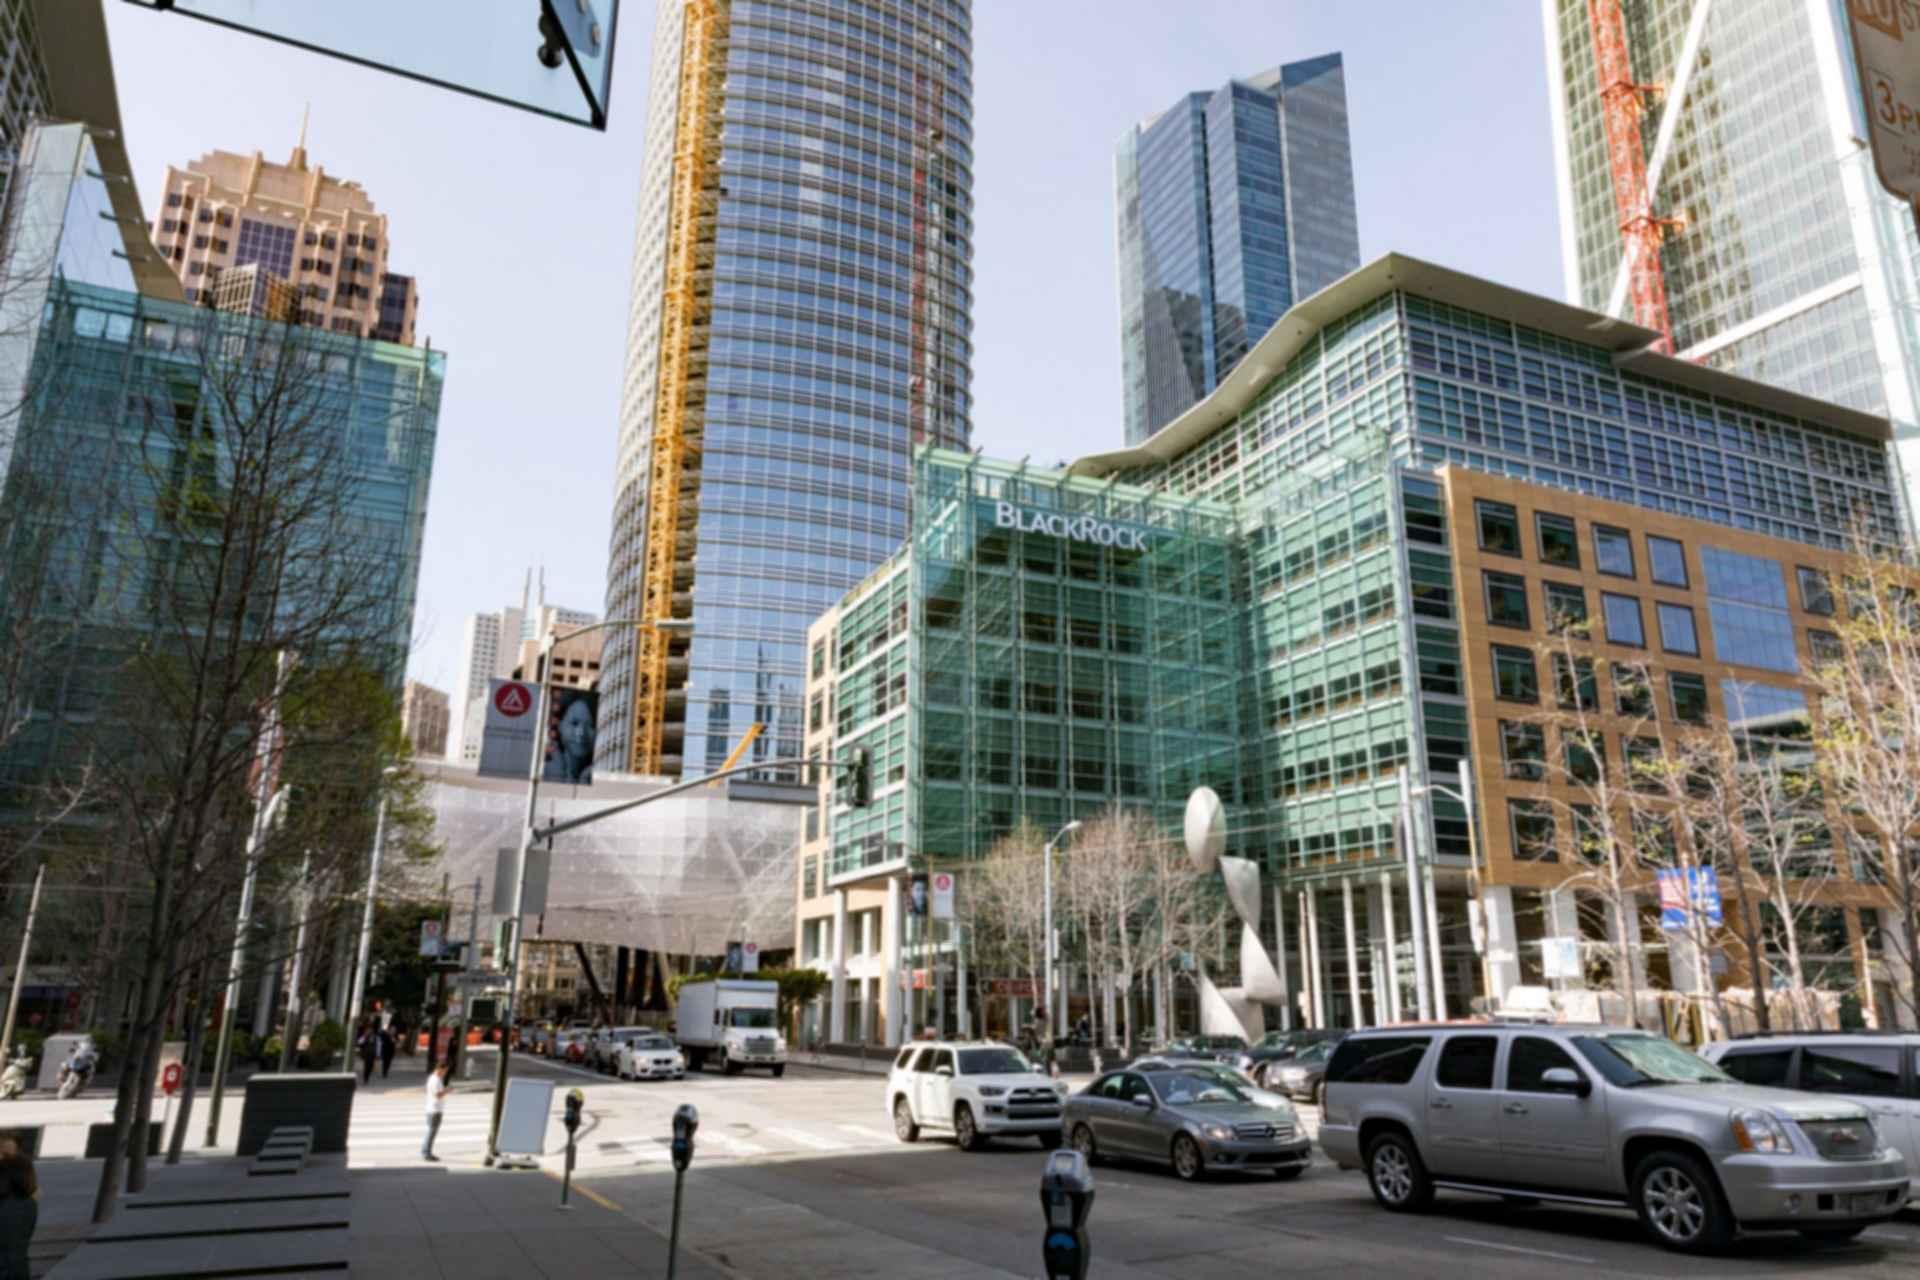 San Francisco BlackRock Offices Street View